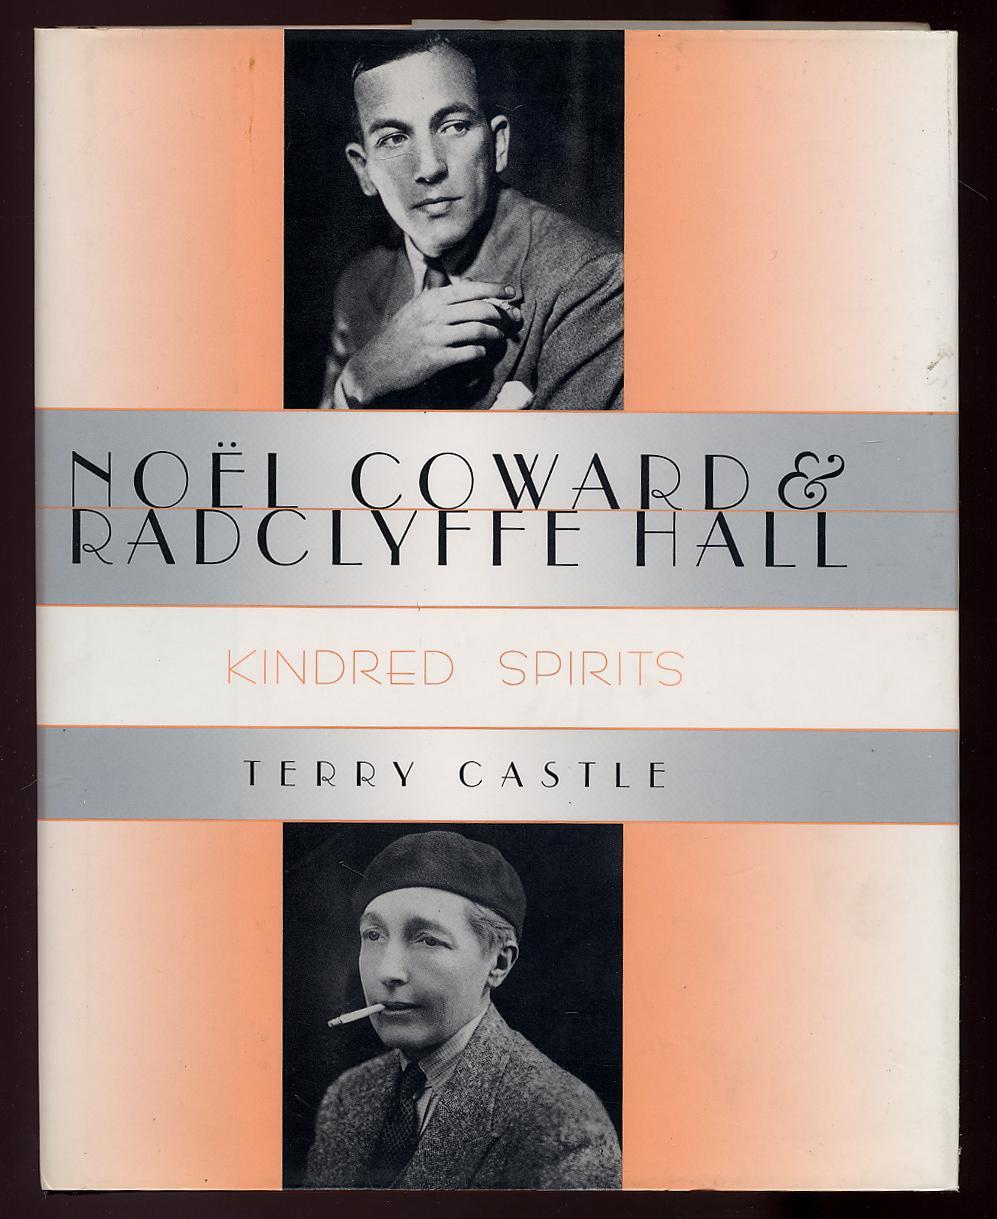 Noel Coward & Radclyffe Hall: Kindred Spirits - CASTLE, Terry